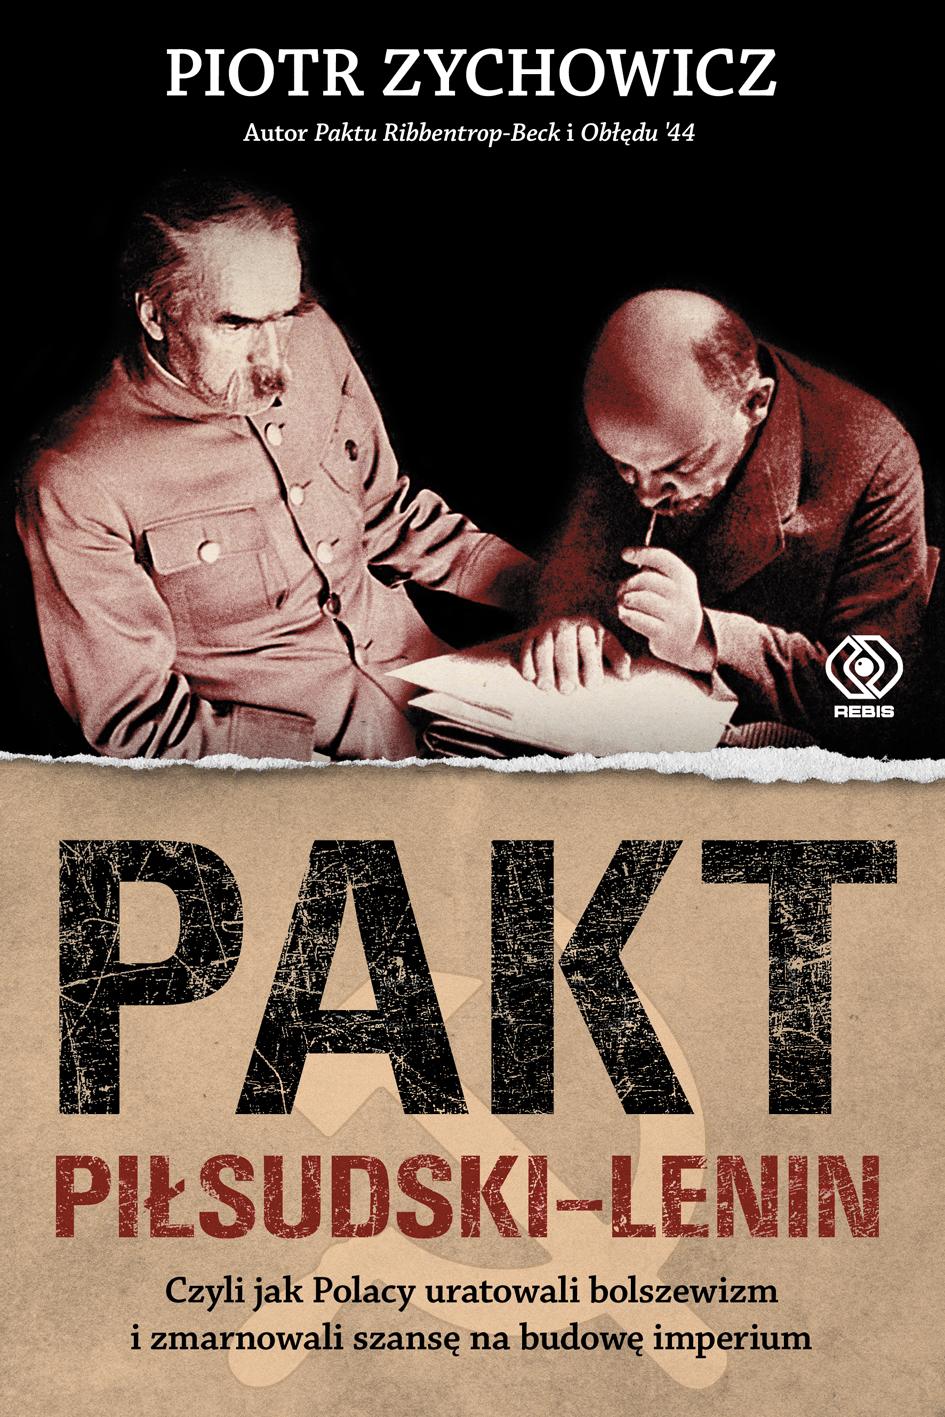 dzien_chlopaka_ksiazki_pakt_pilsudski_lenin